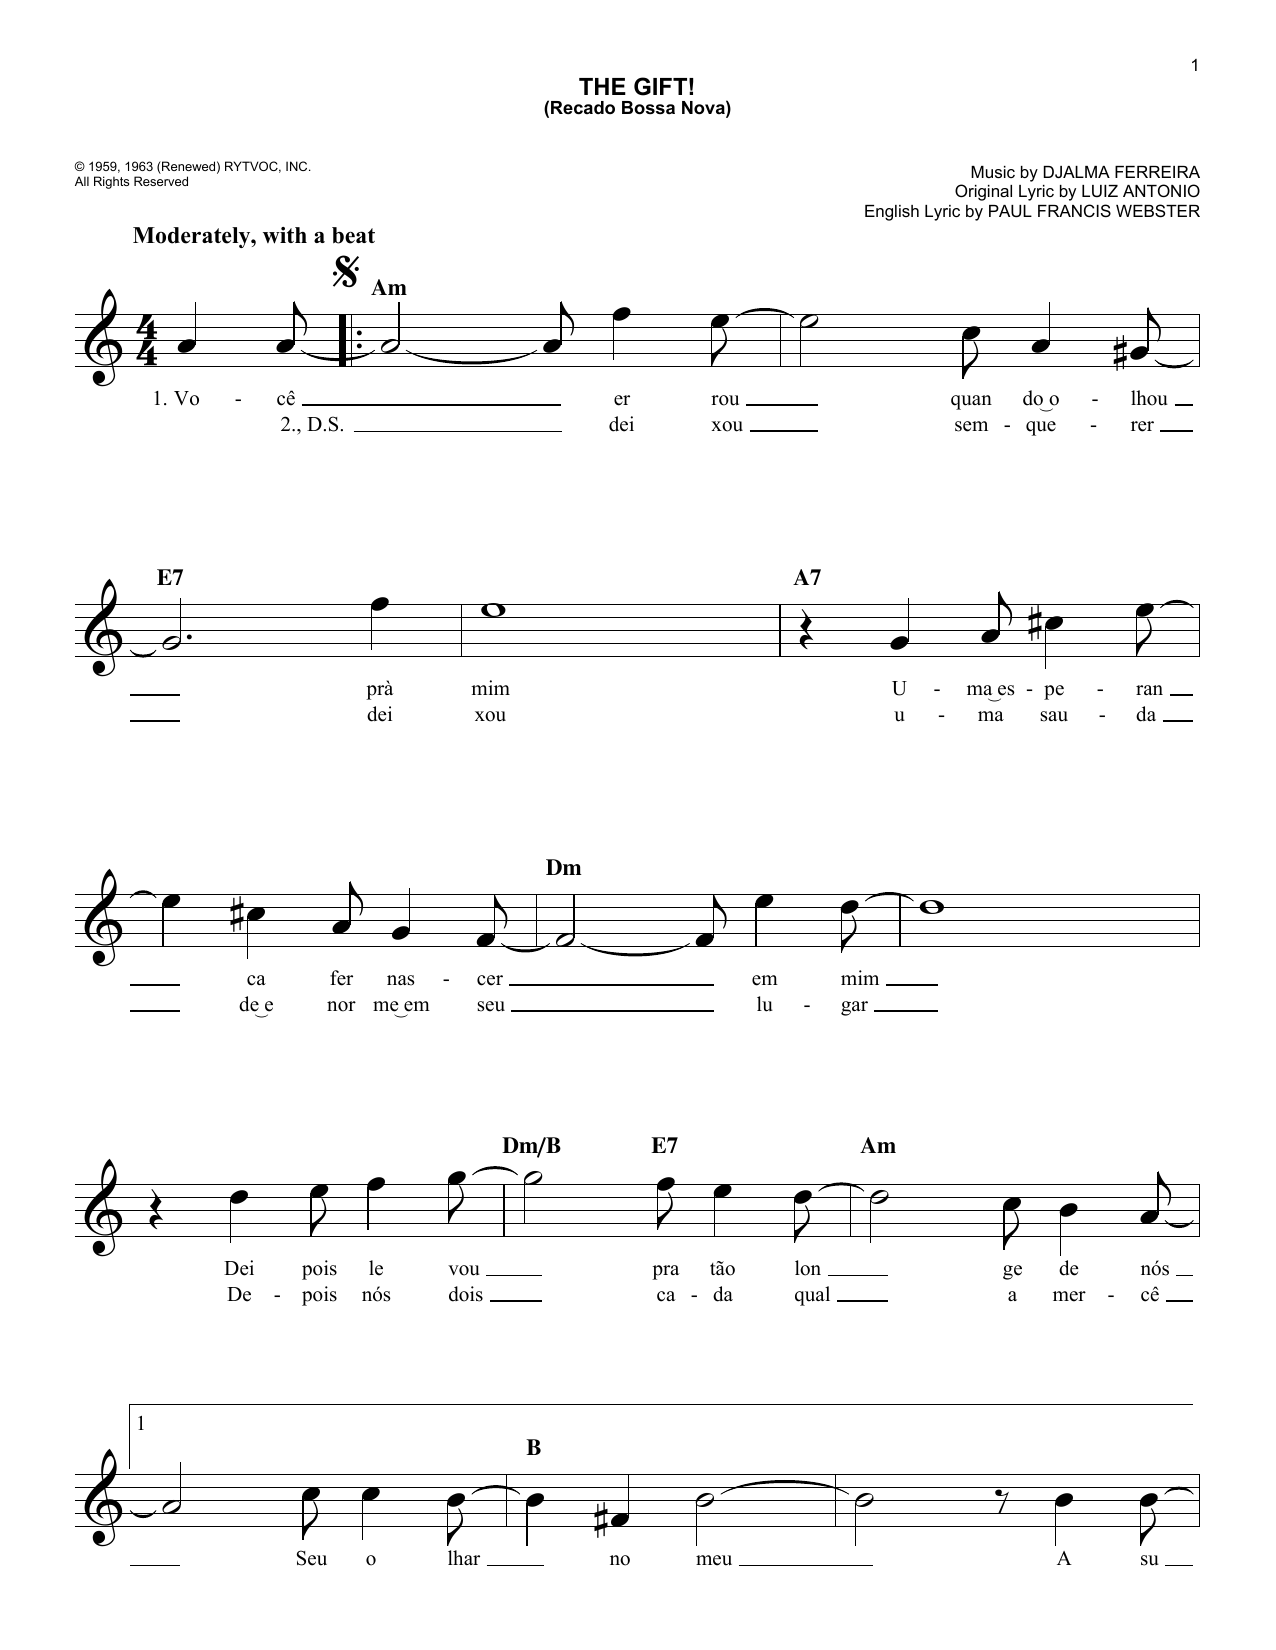 Djalma Ferreira The Gift! (Recado Bossa Nova) sheet music notes and chords. Download Printable PDF.